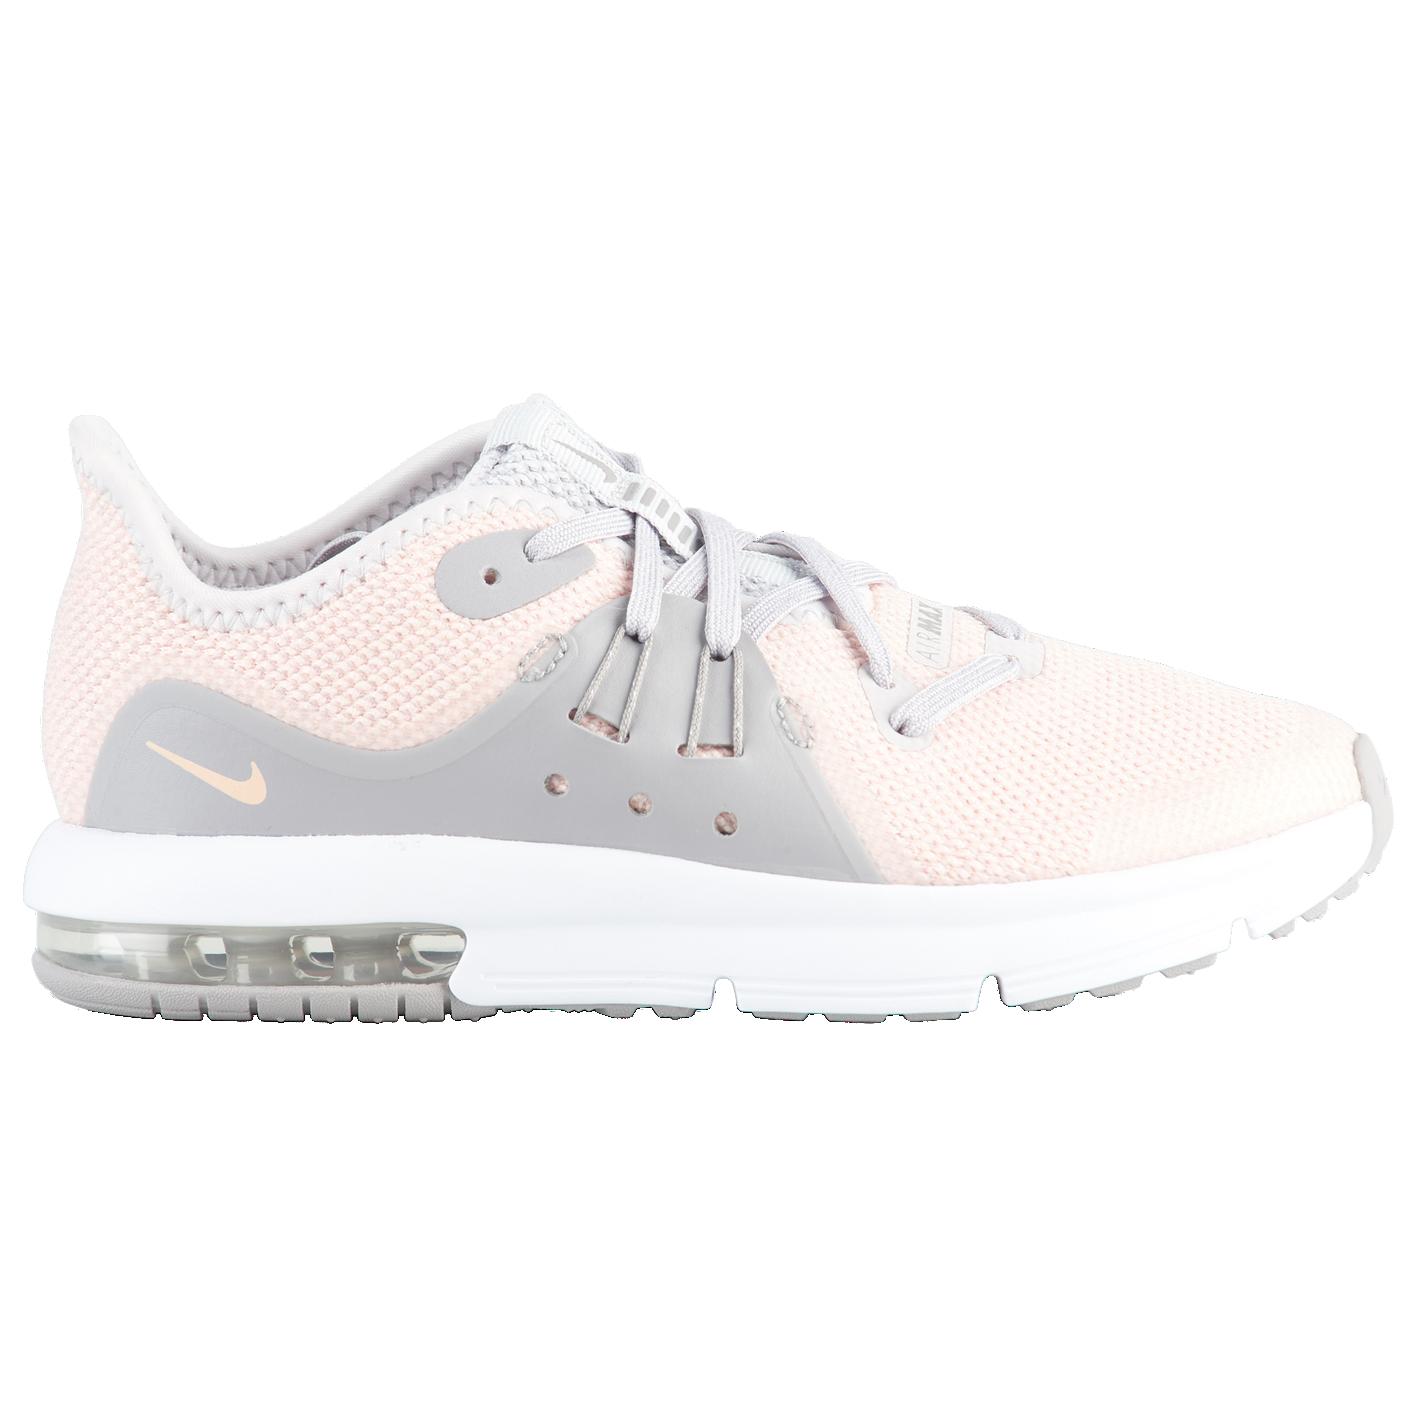 4155c3502e873a Nike Air Max Sequent 3 - Girls  Preschool - Running - Shoes - Vast ...